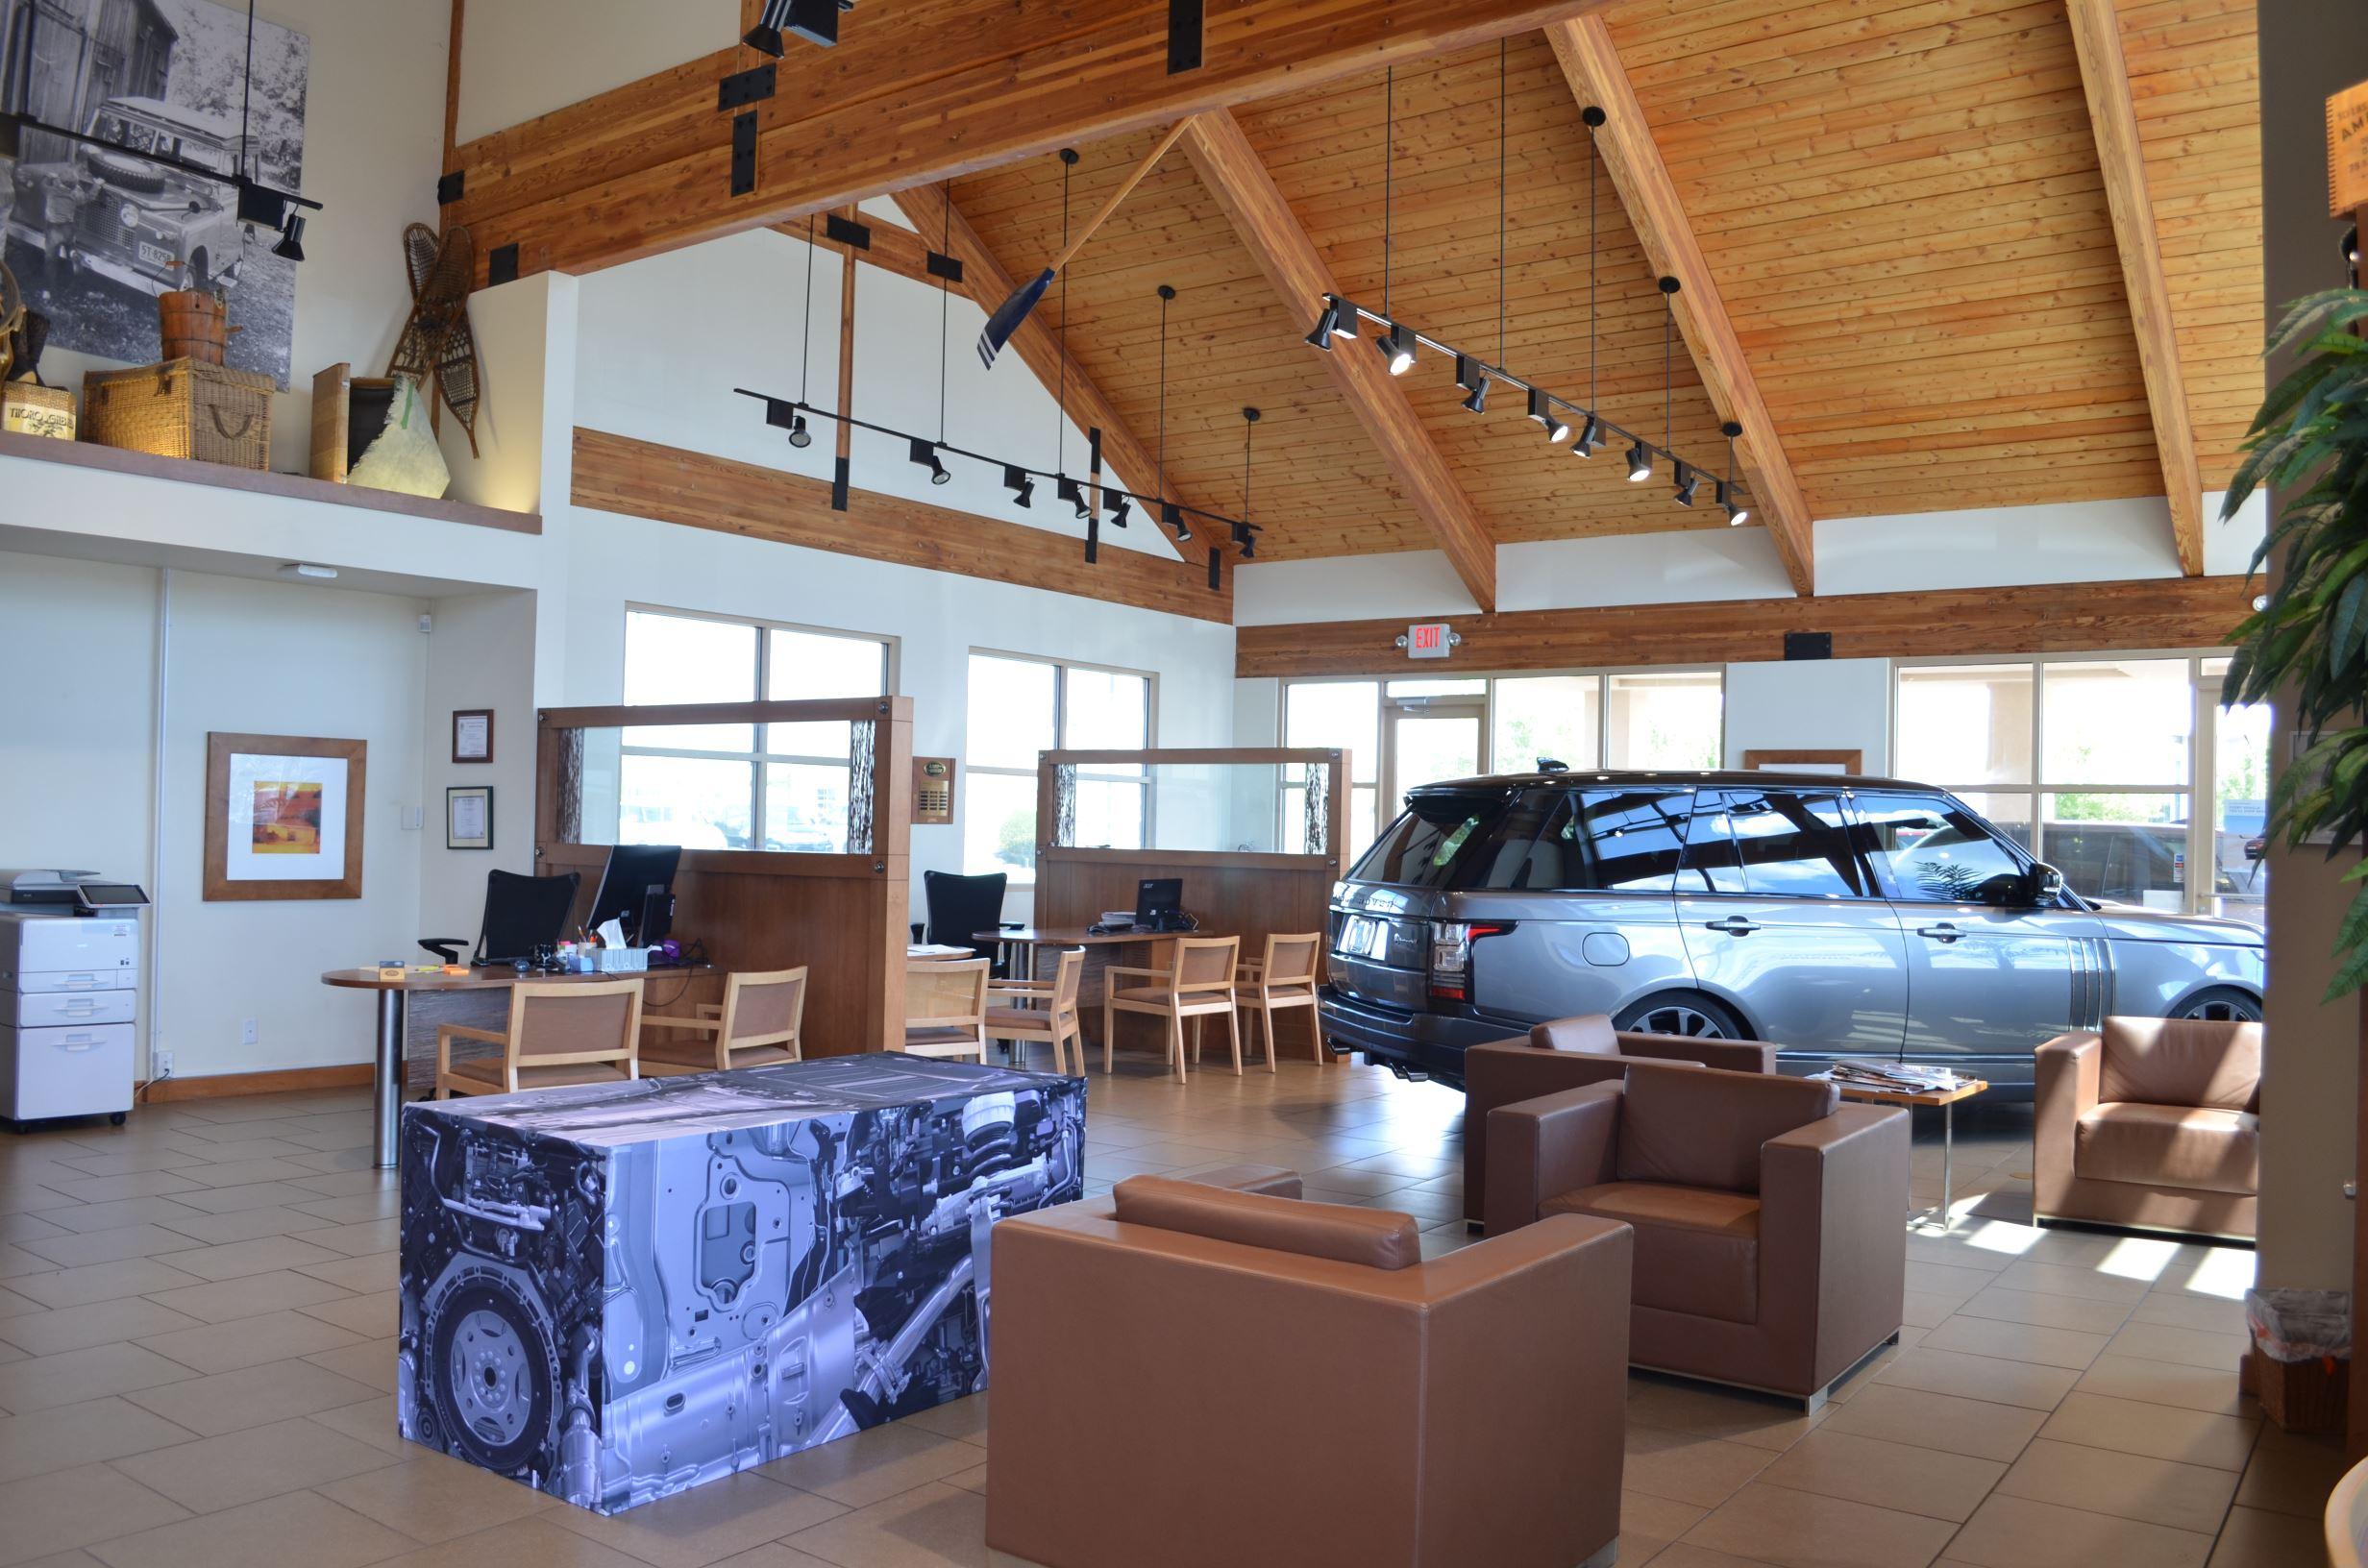 Land Rover Santa Fe image 4